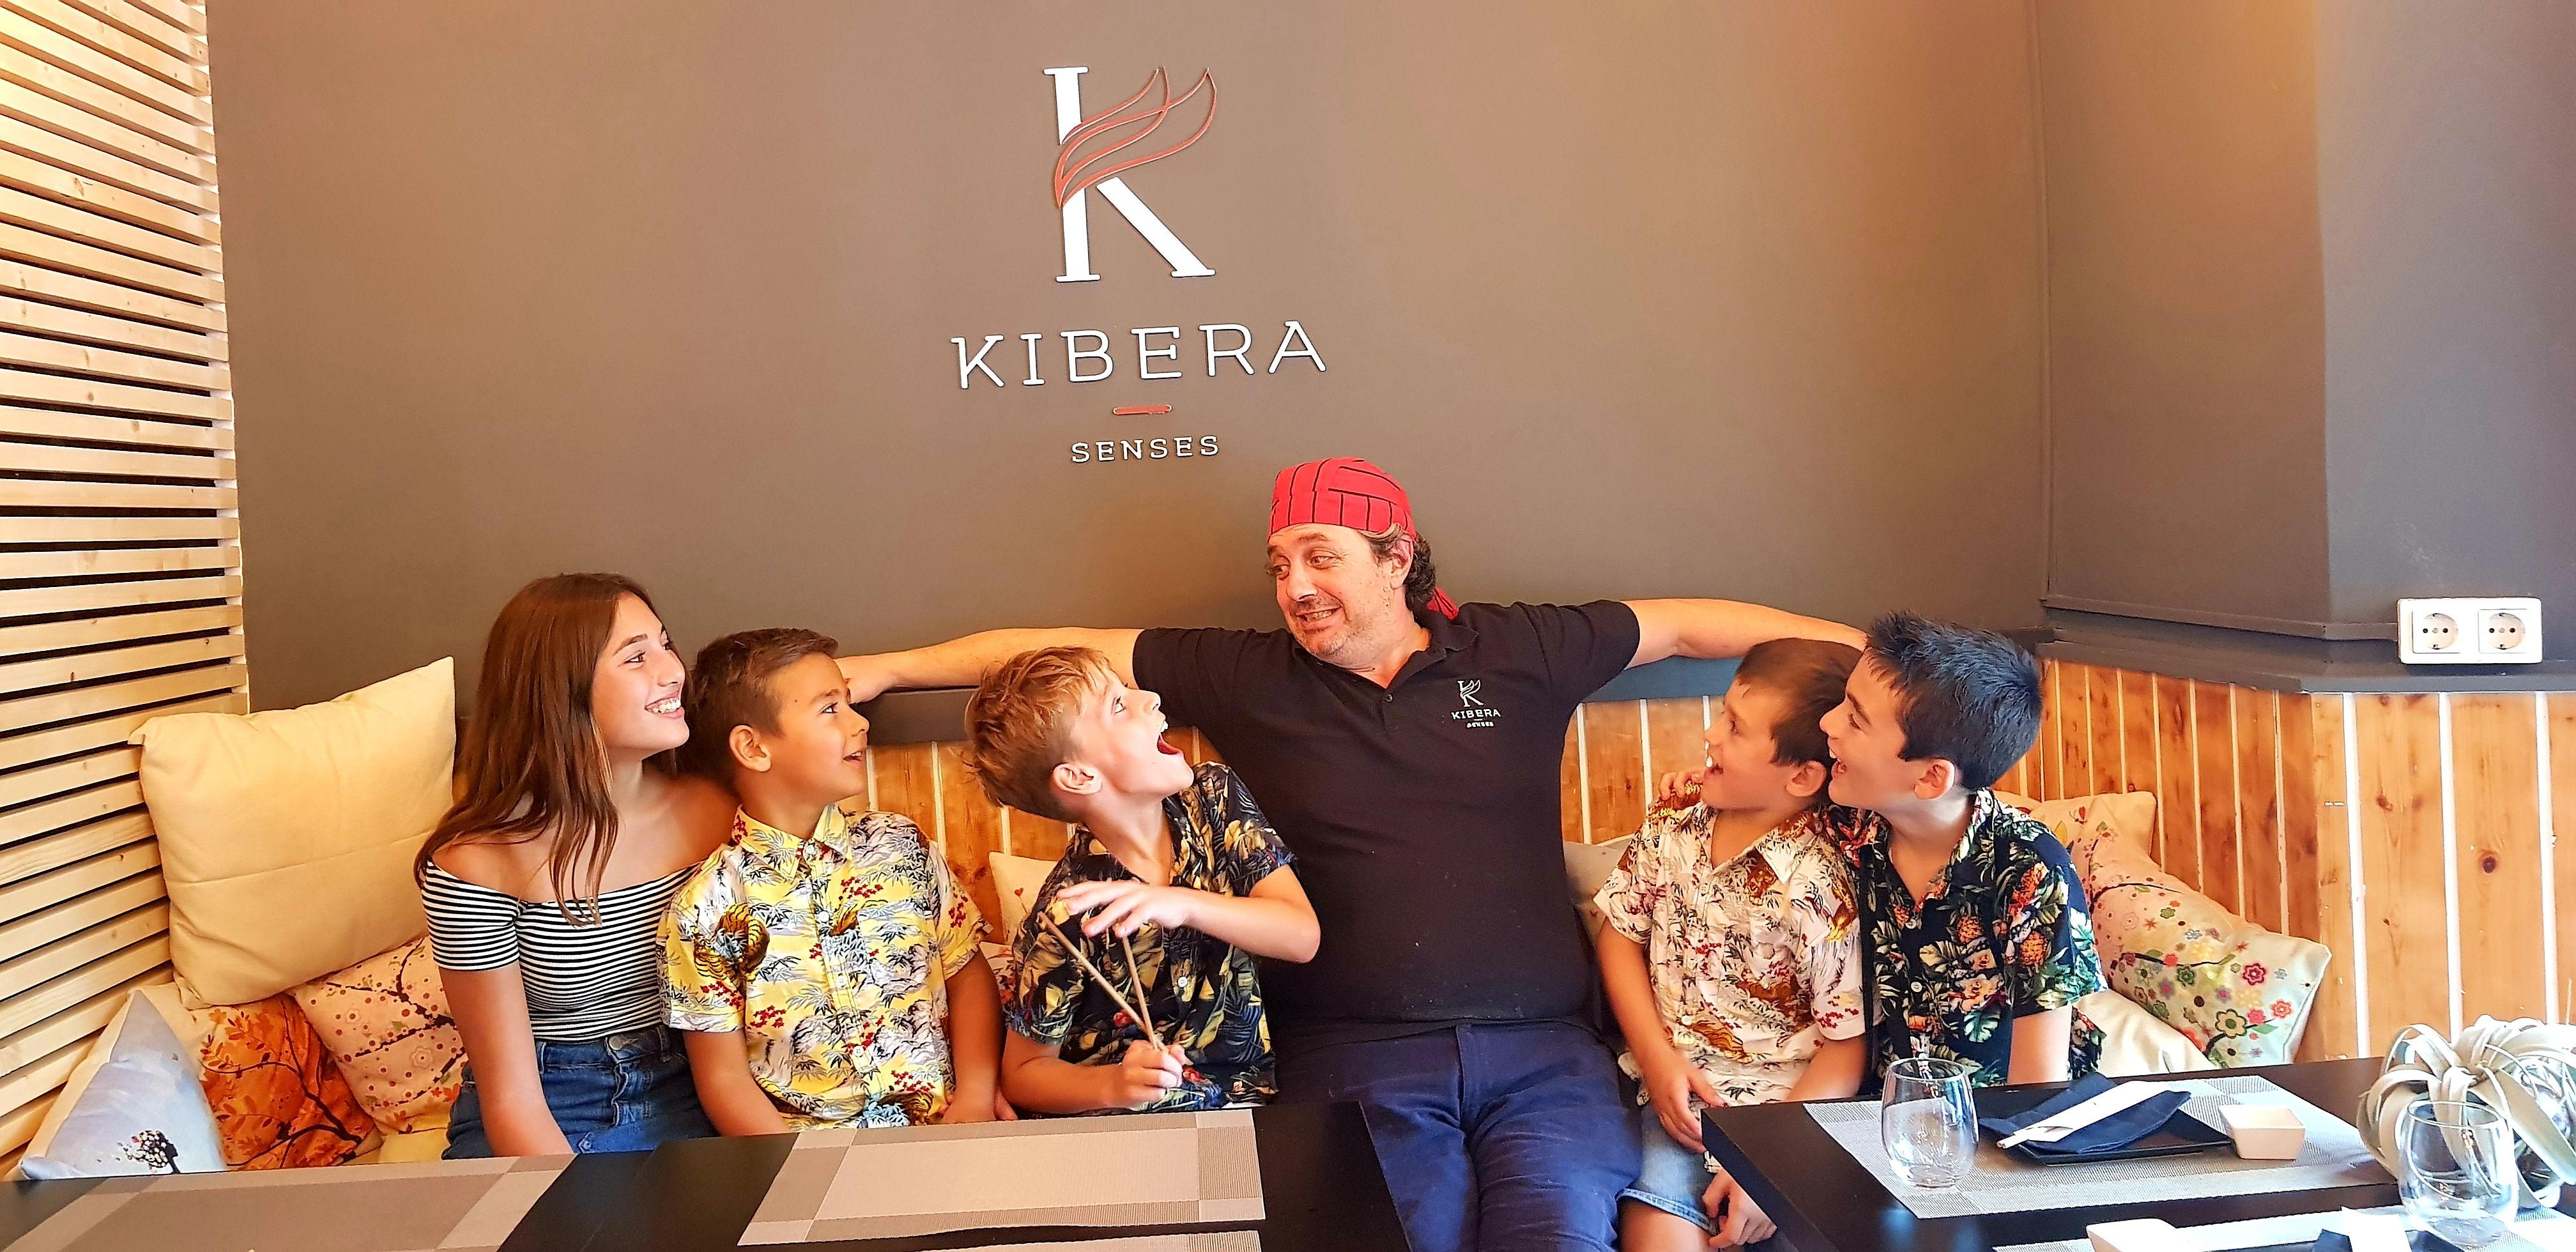 Foto 20 de Japanese cuisine en  | Kibera Senses